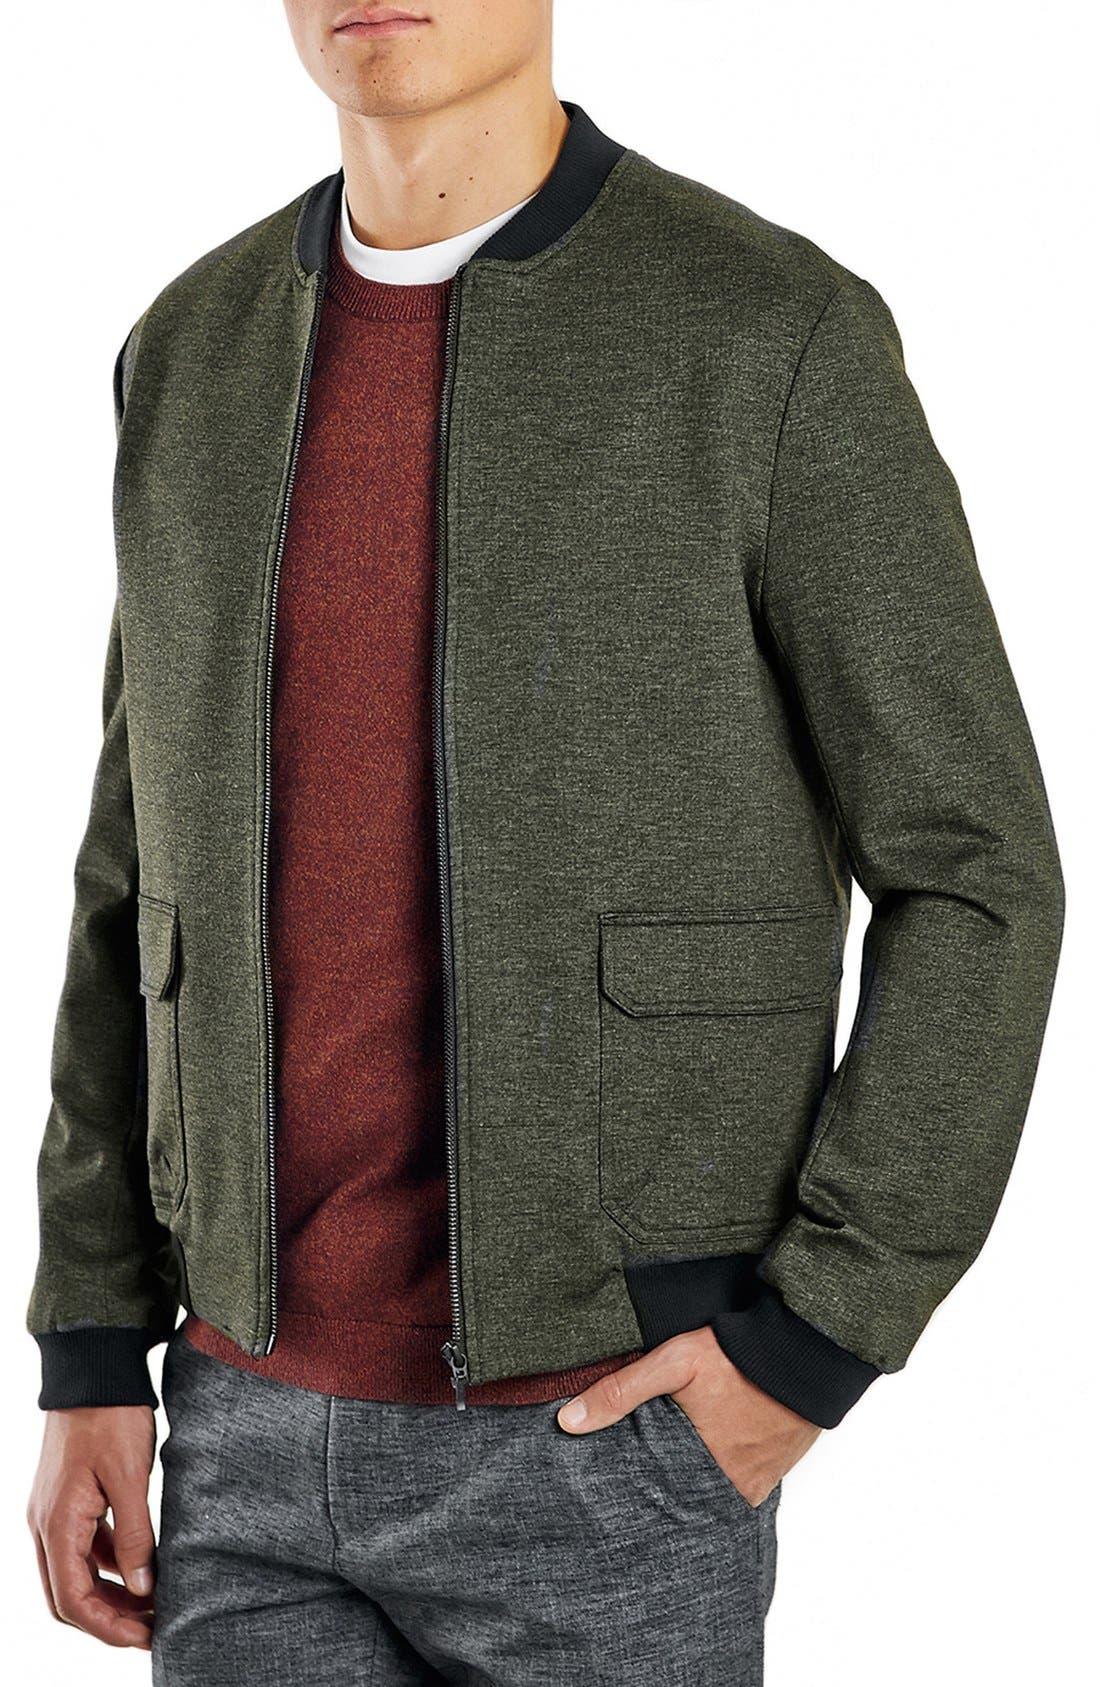 TOPMAN Olive Bomber Jacket, Main, color, 300